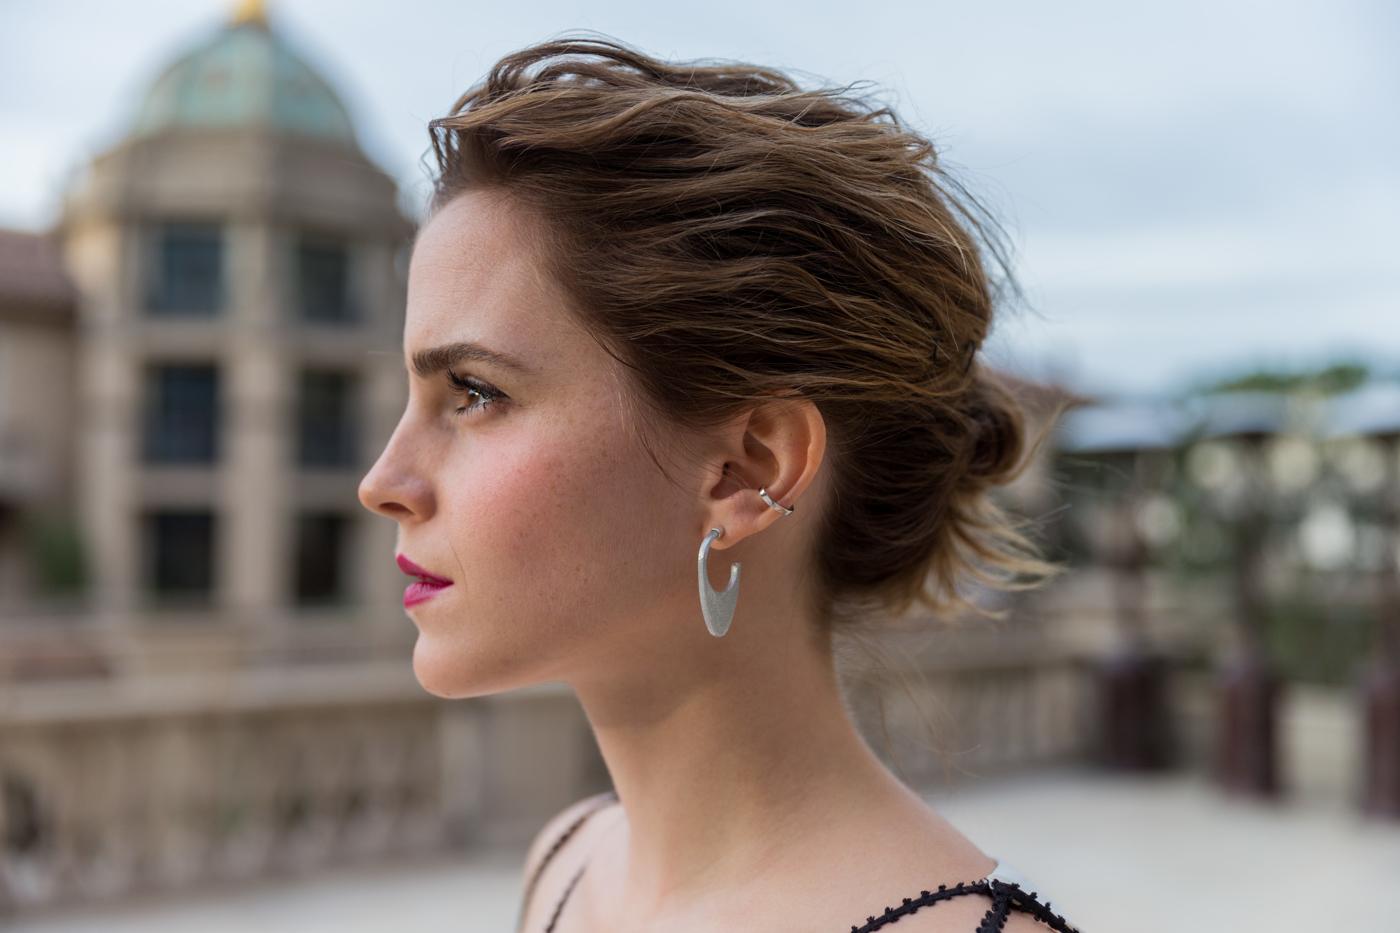 Article22. Dome earring. Emma Watson. Återvunnet.